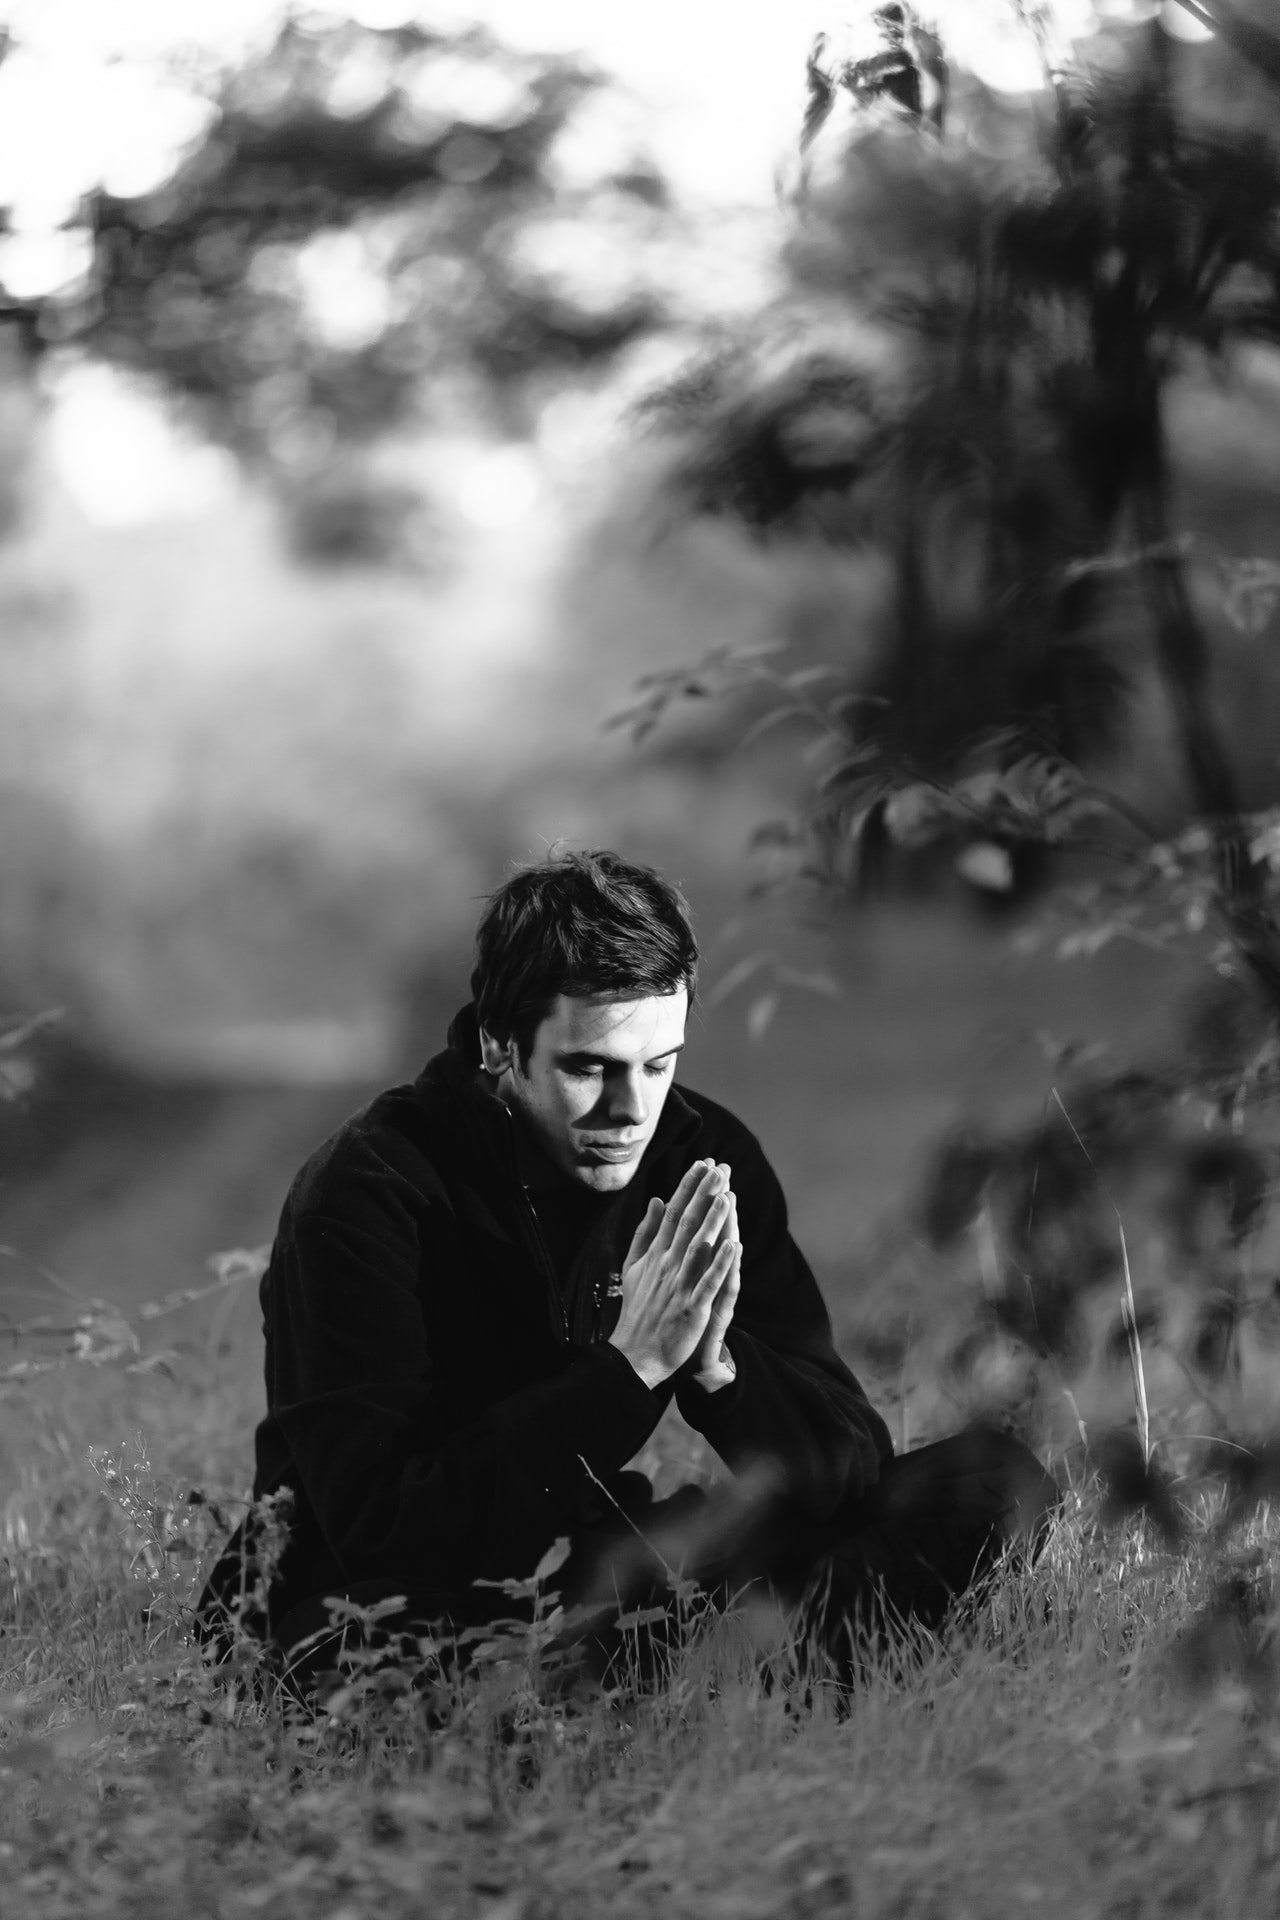 Man sitting on a grass field praying